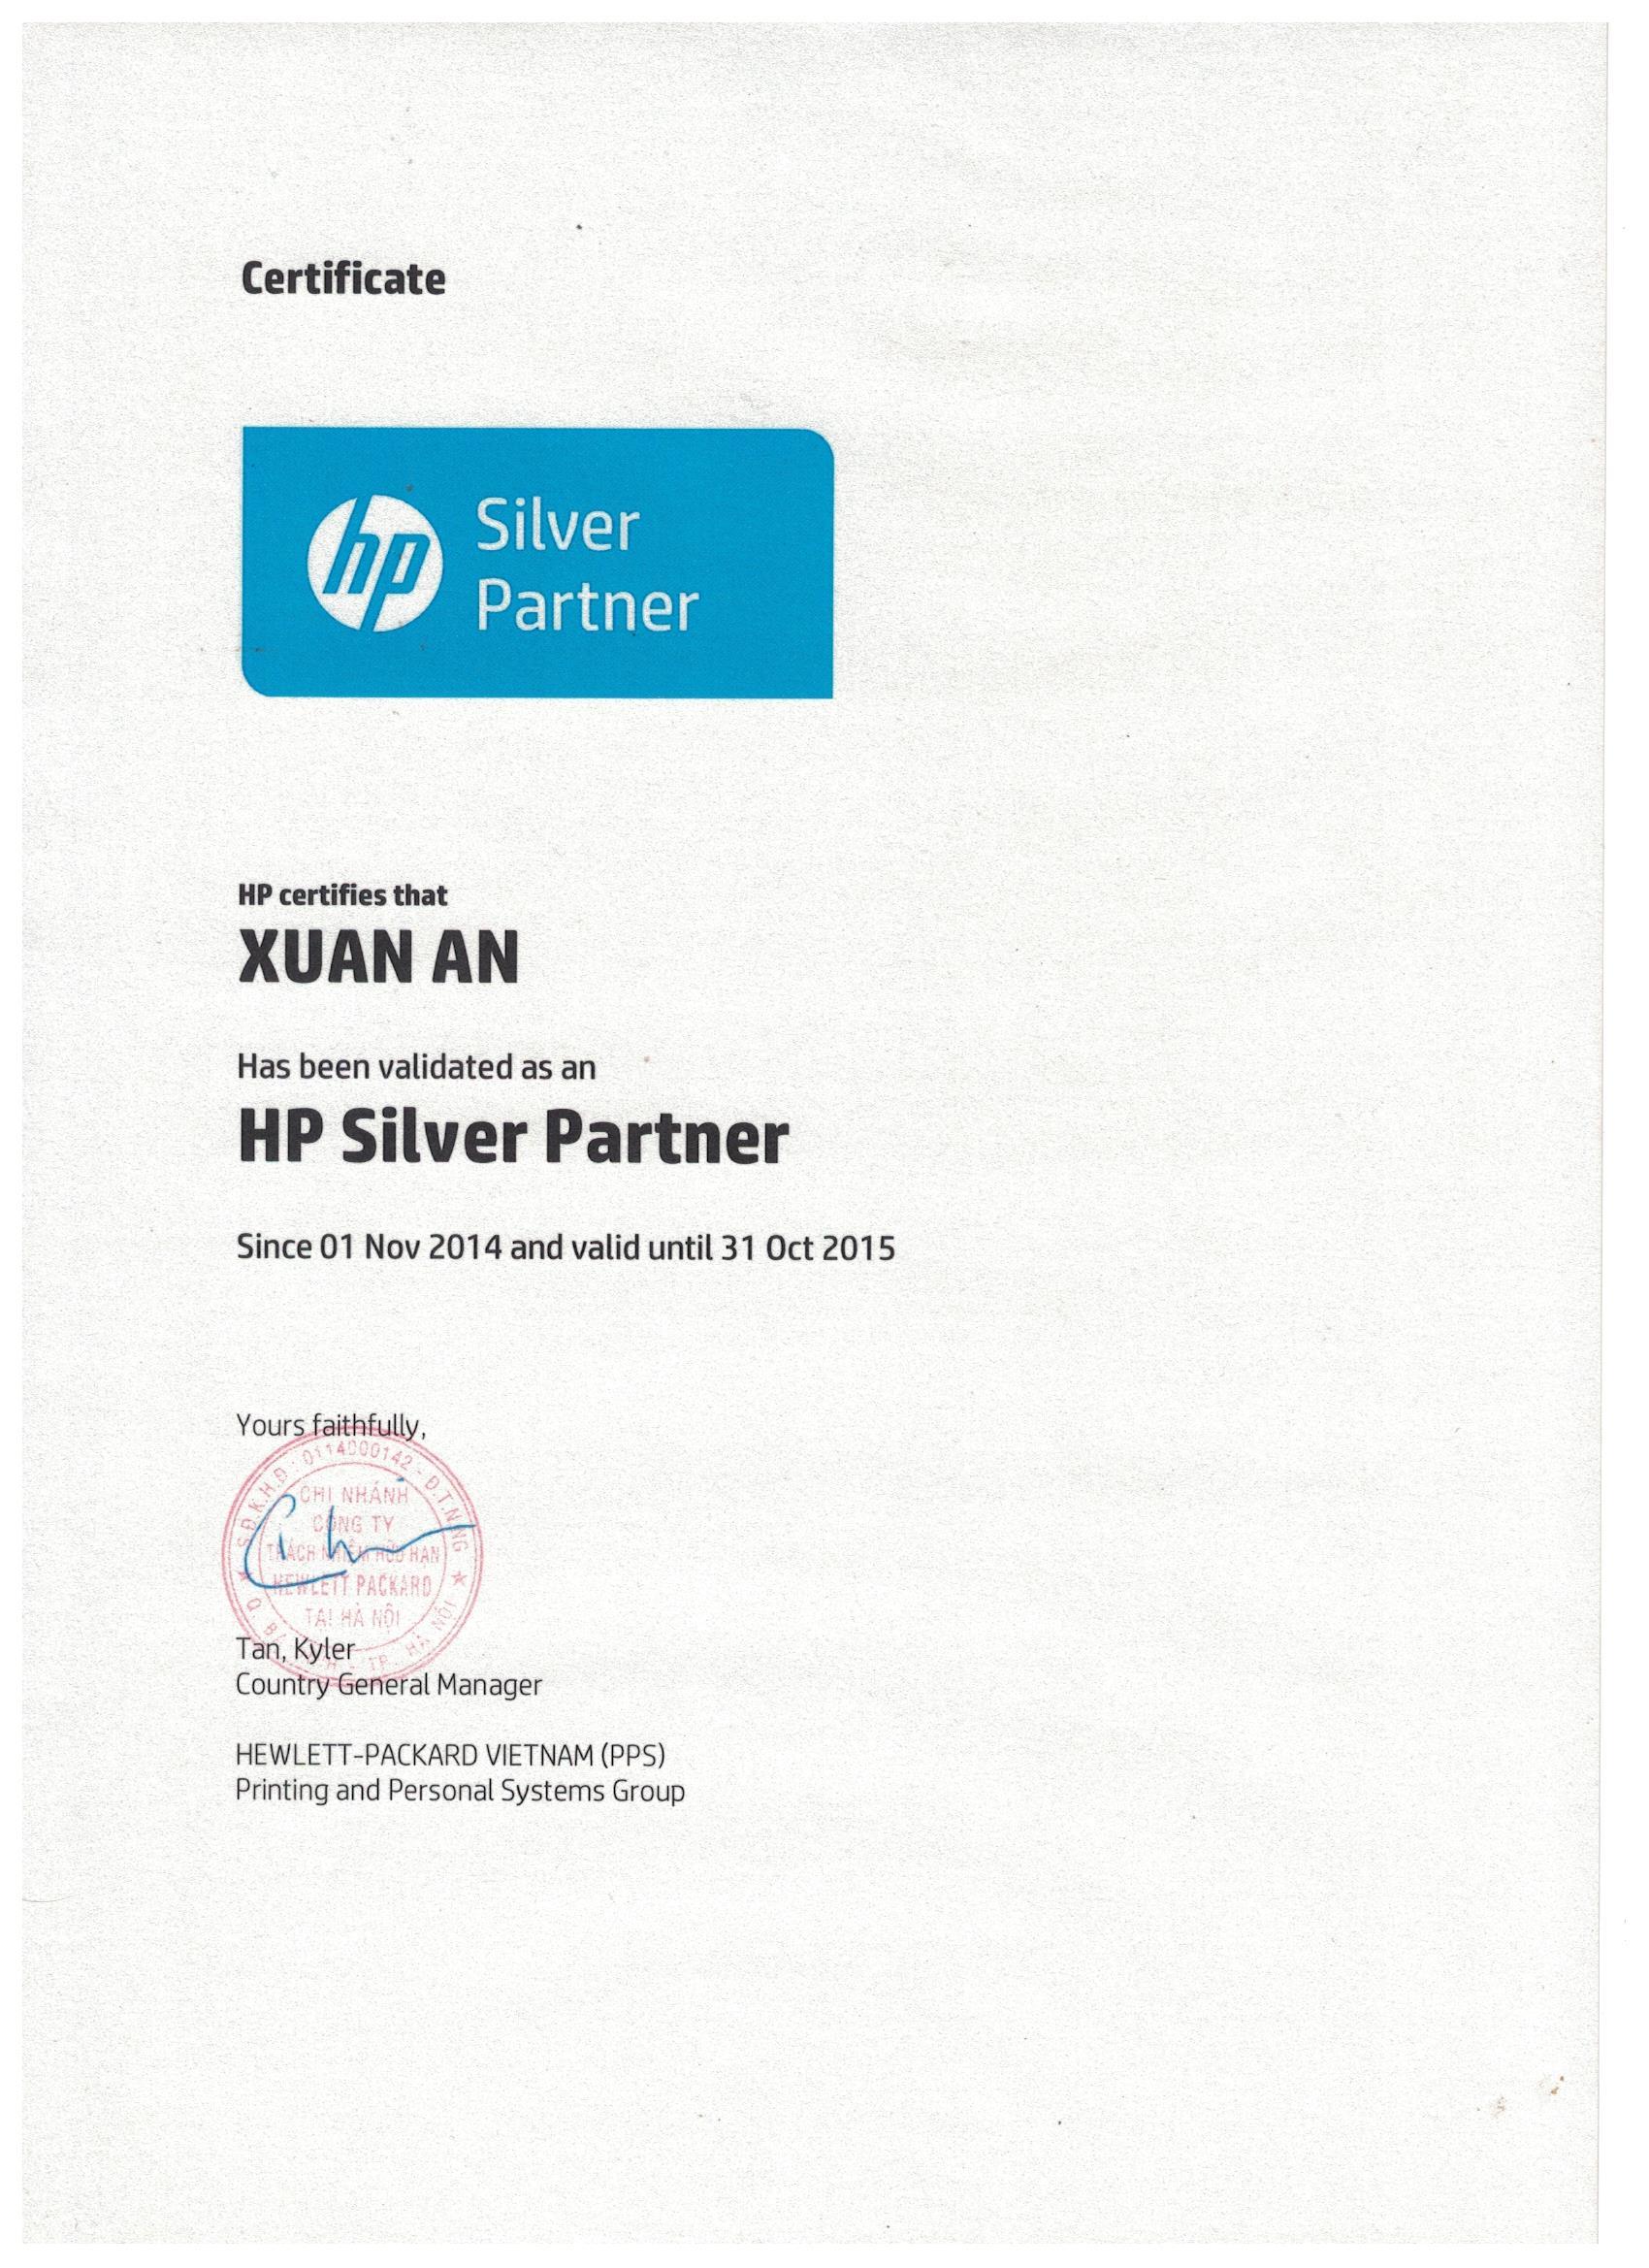 HP Probook 430 G7 - 9GQ00PA (Silver)